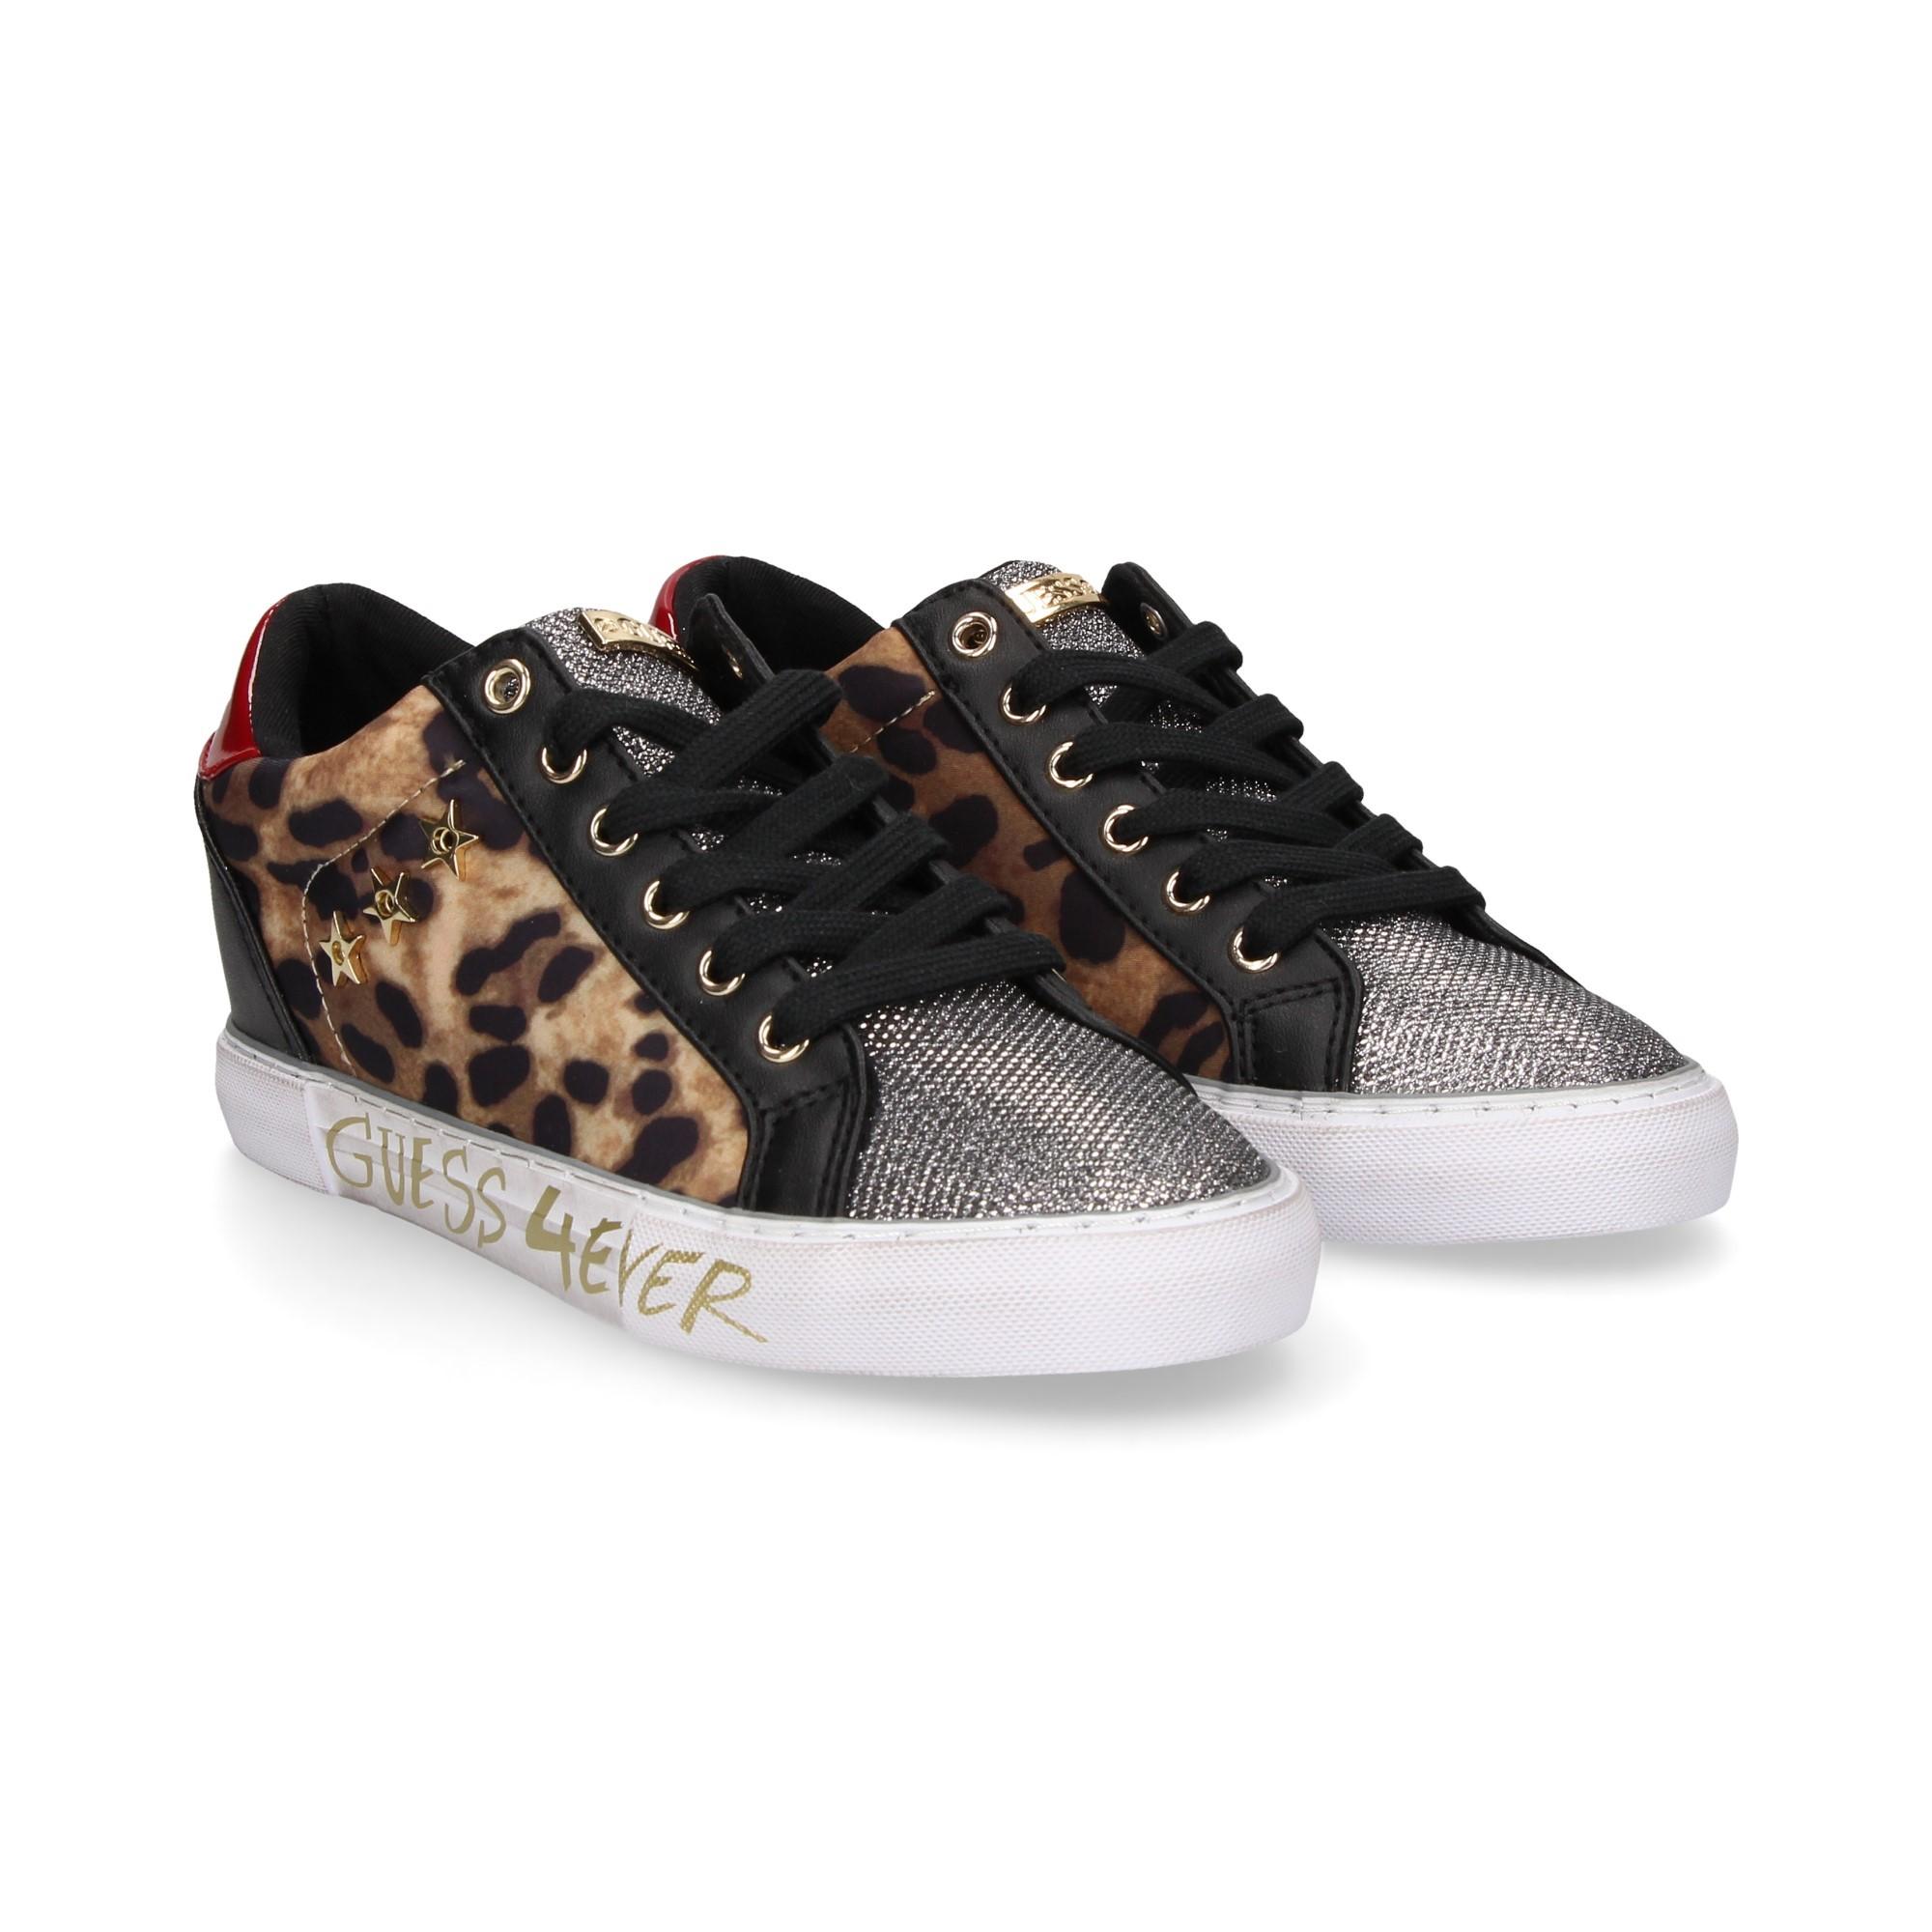 deportivo-textil-leopardo